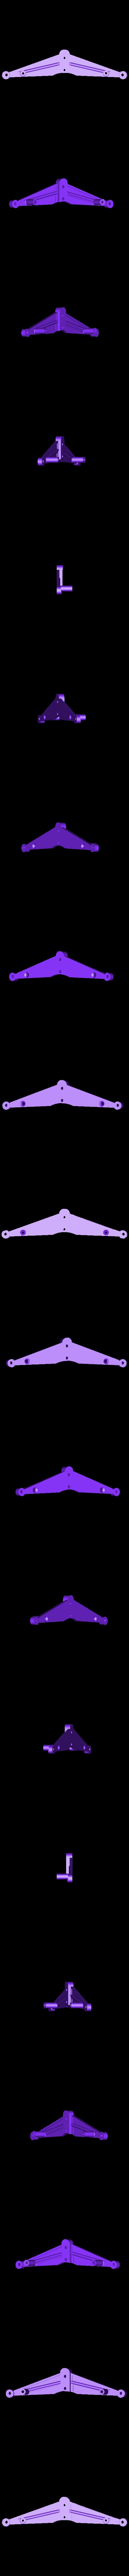 lower suspension arms.stl Download free STL file Aryton Senna's Mclaren MP4/6 3d Printed RC F1 Car • 3D printing design, brett